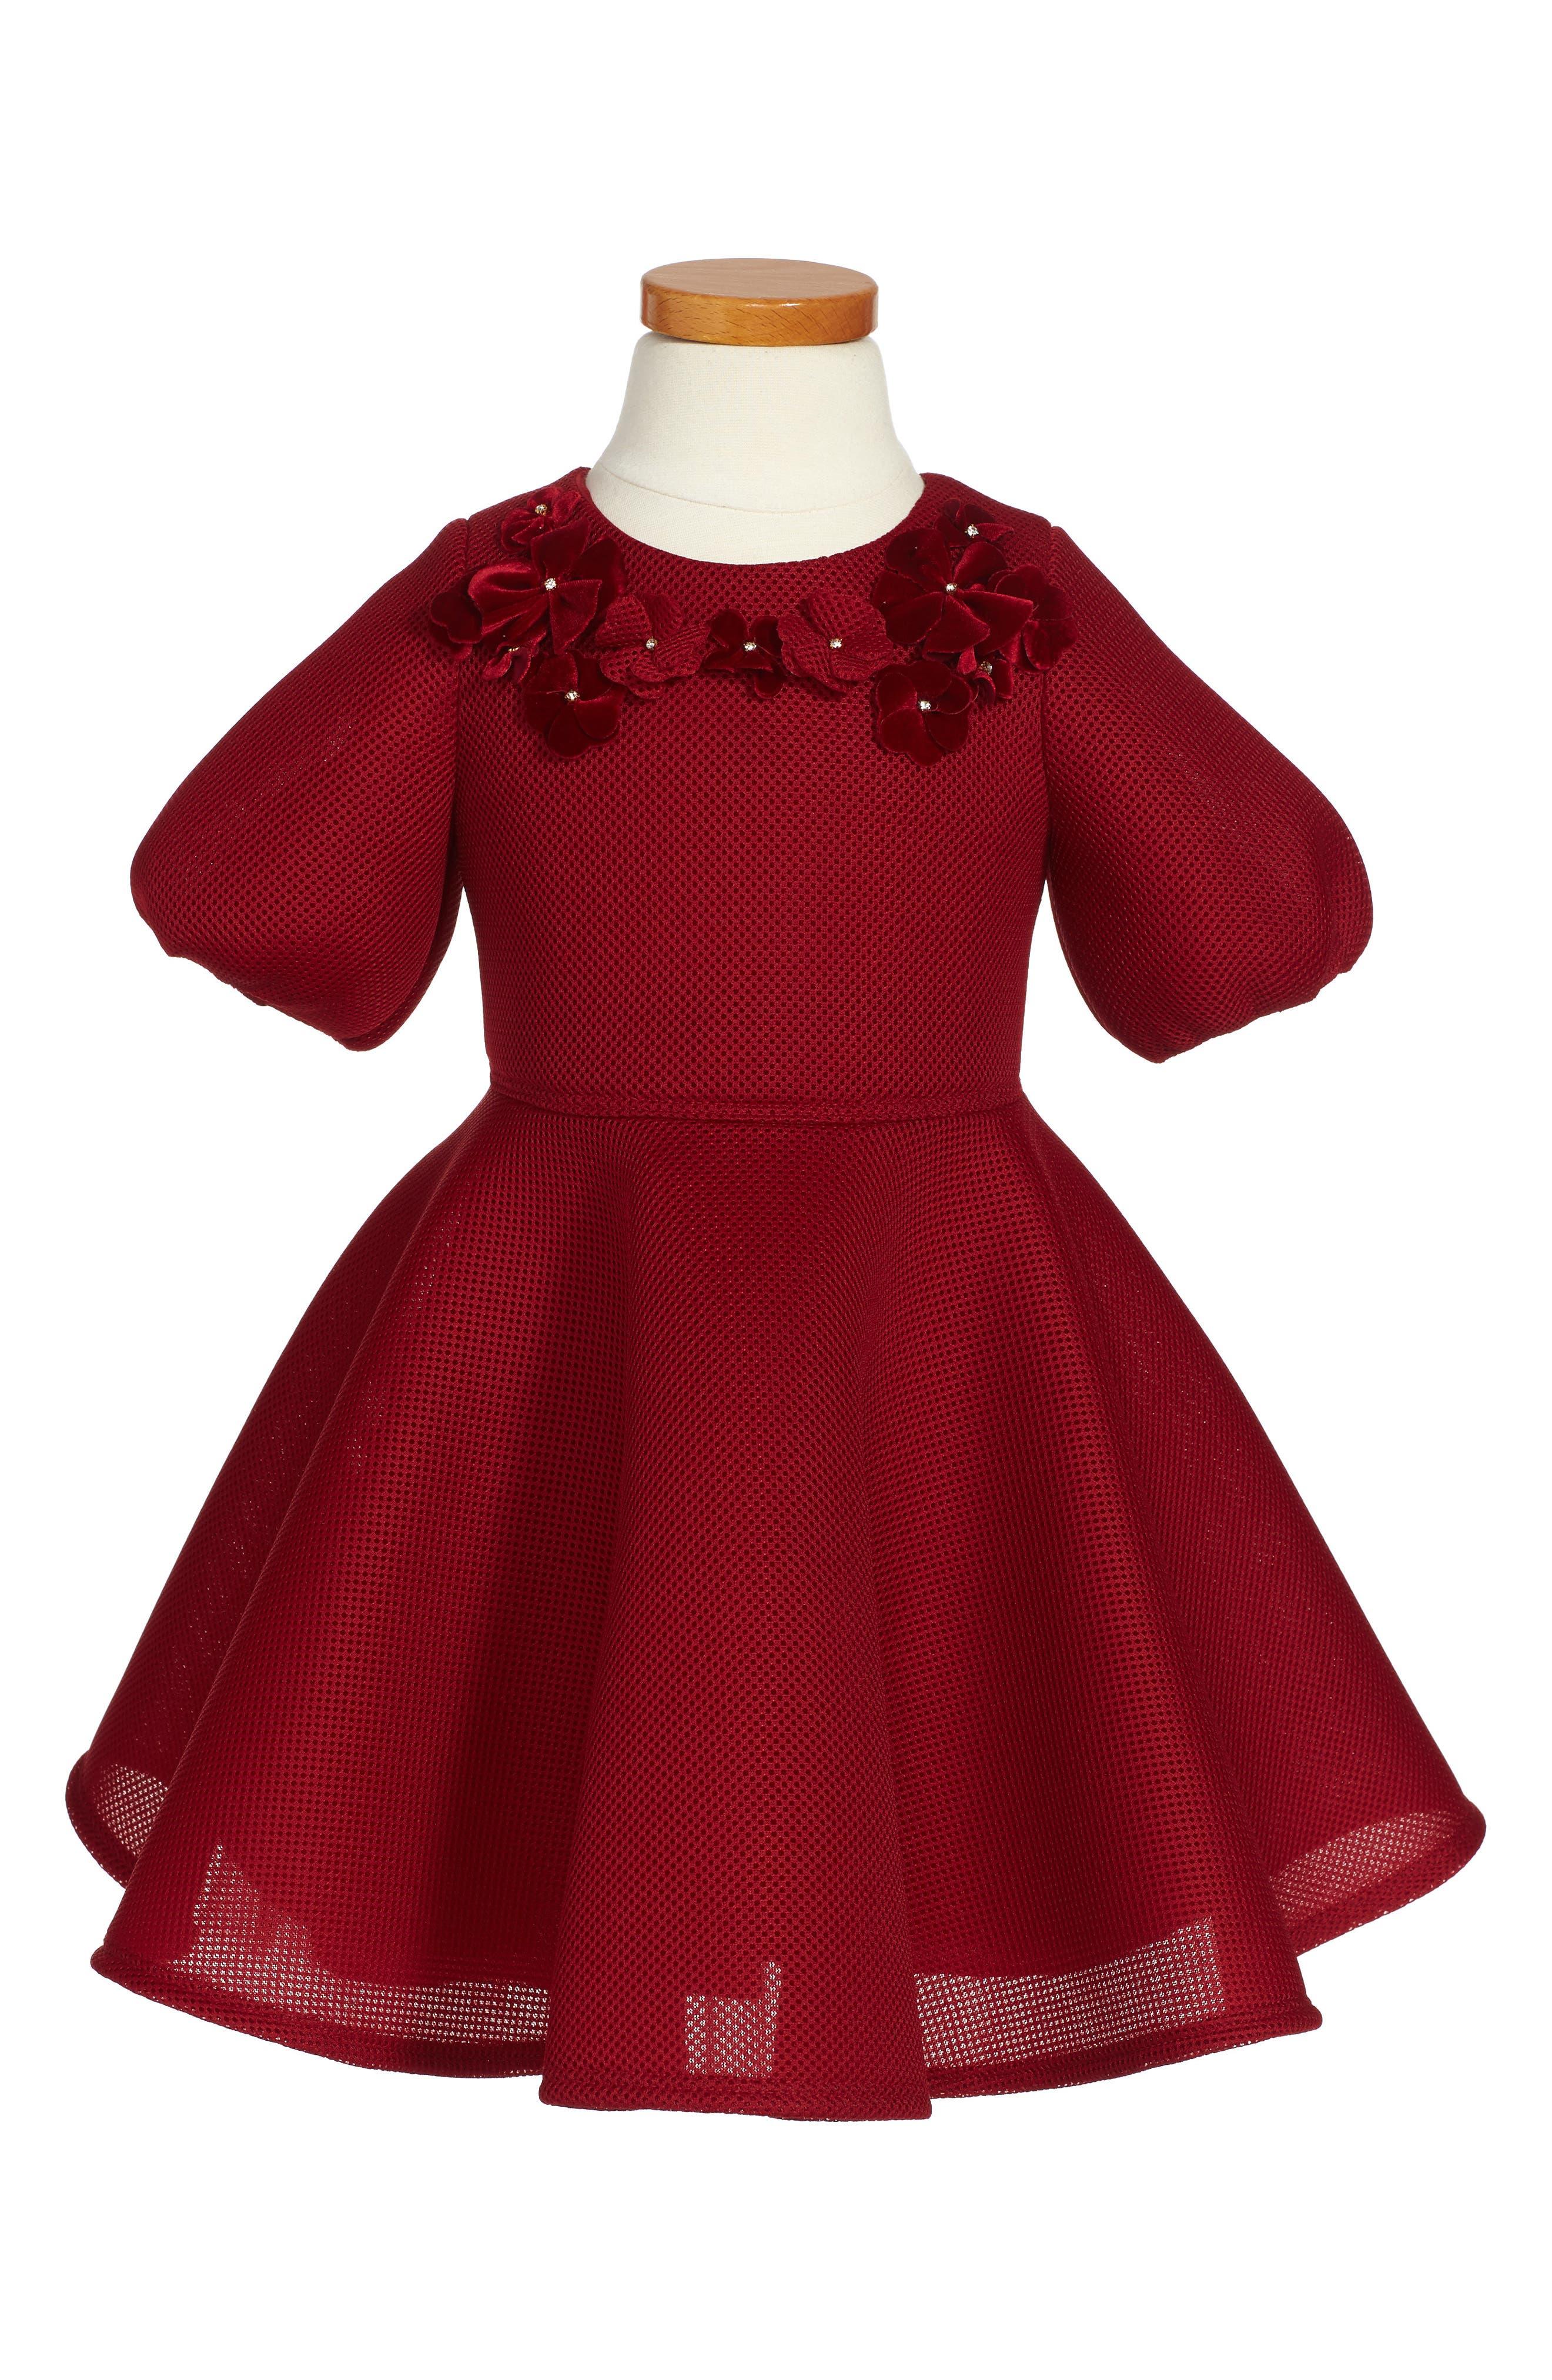 Main Image - David Charles Techno Scuba Mesh Dress (Toddler Girls & Little Girls)